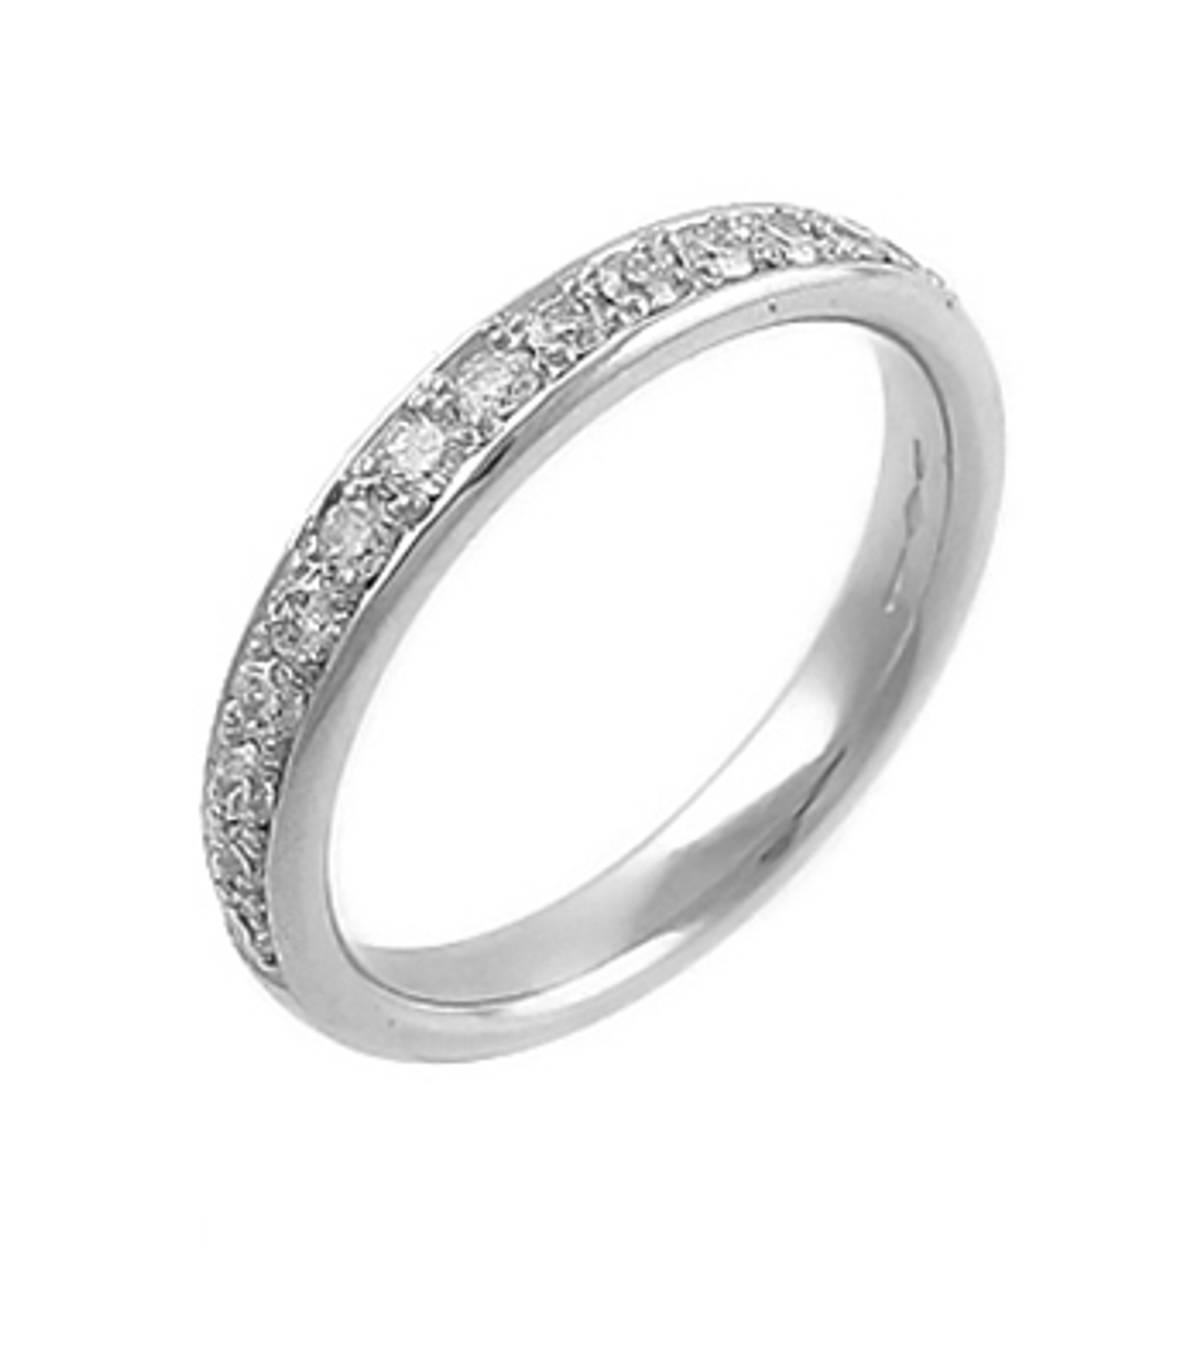 18k white gold brilliant cut diamond milgrain set wedding ring Carat: total diamond weight 0.45cts Metal: 18k white gold